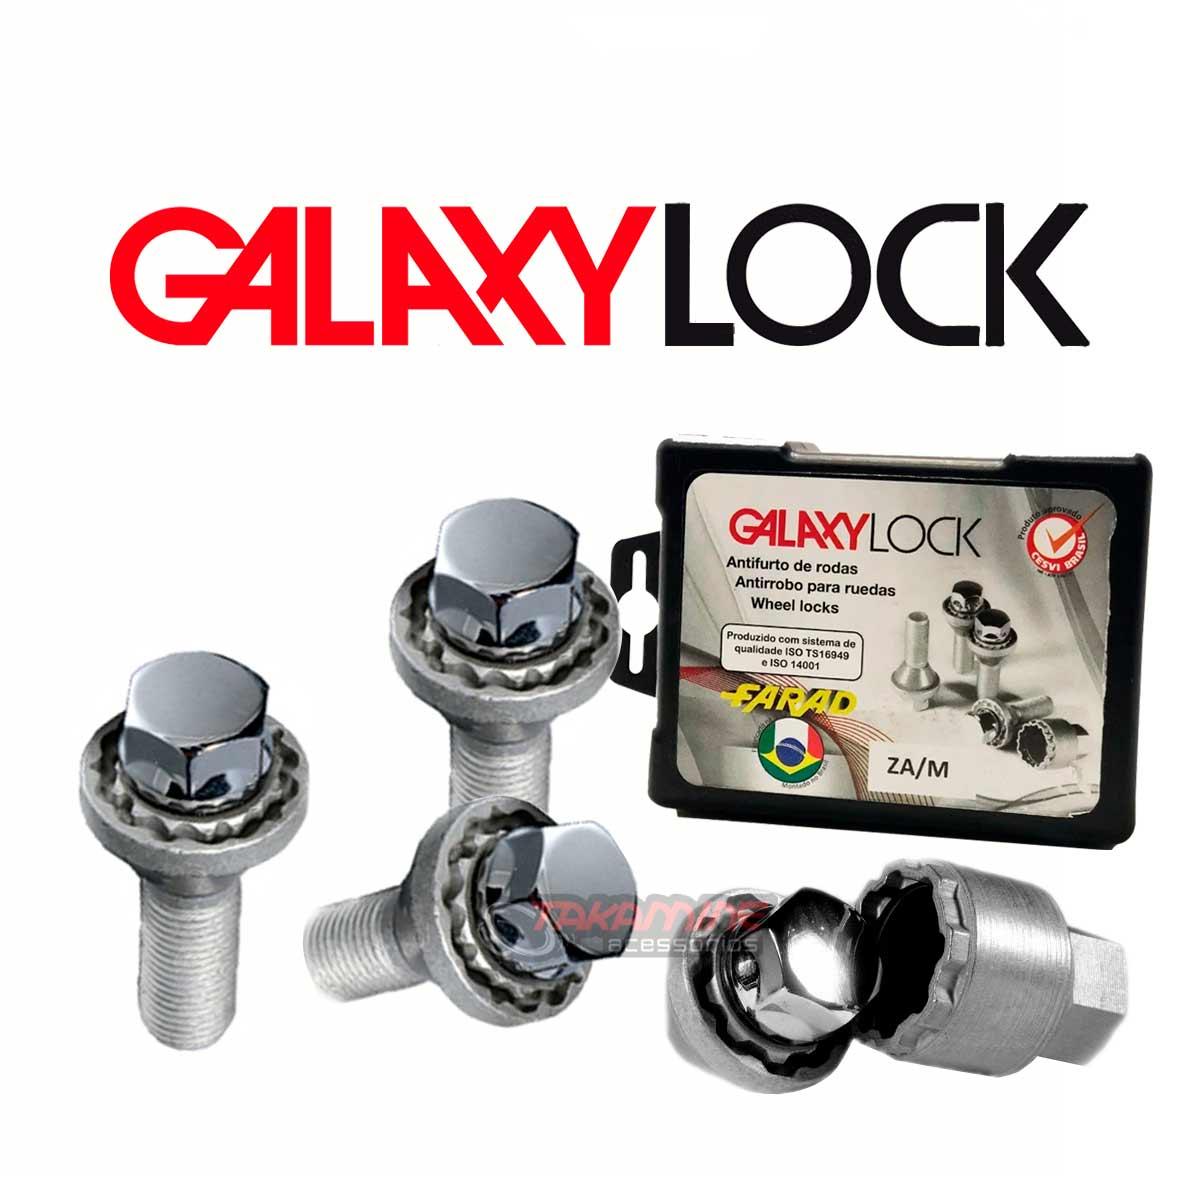 Parafuso antifurto para rodas Galaxy Lock Parati 1982 até 2012 (roda de liga) L2/M